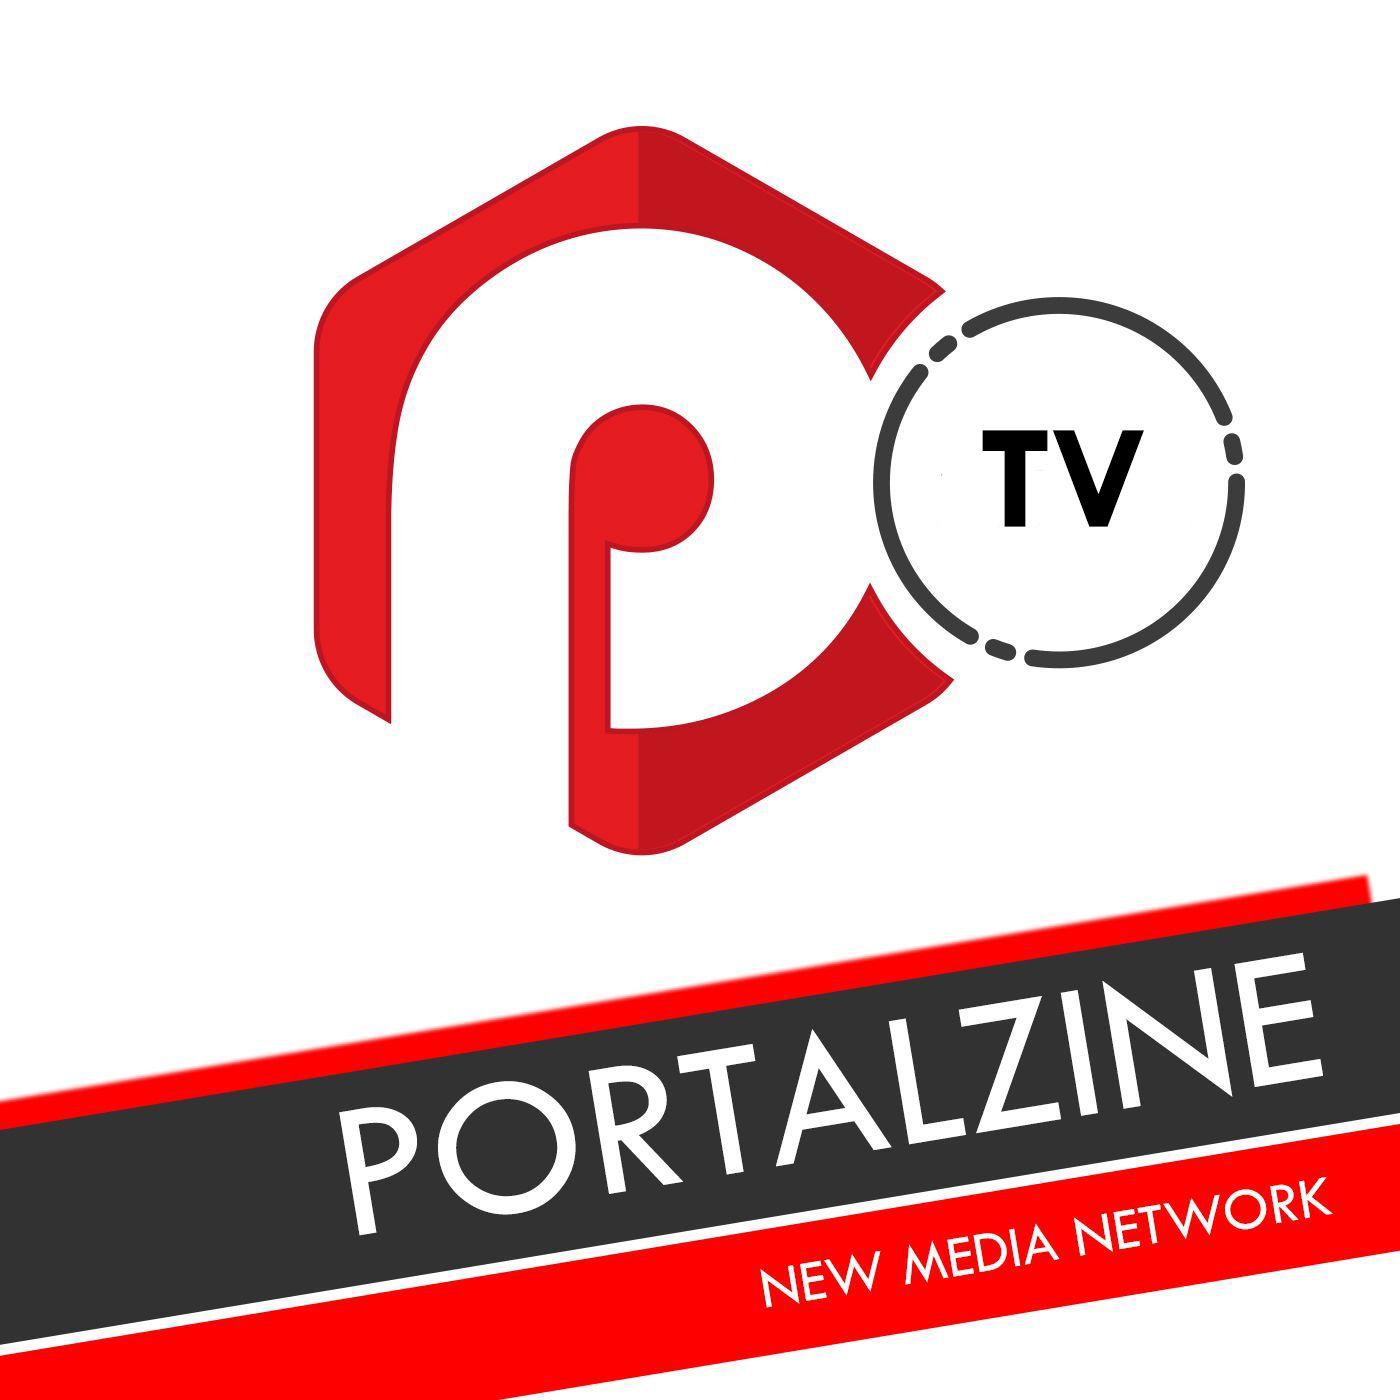 <![CDATA[portalZINE.TV - Spass an neuer Technologie [SD]]]>